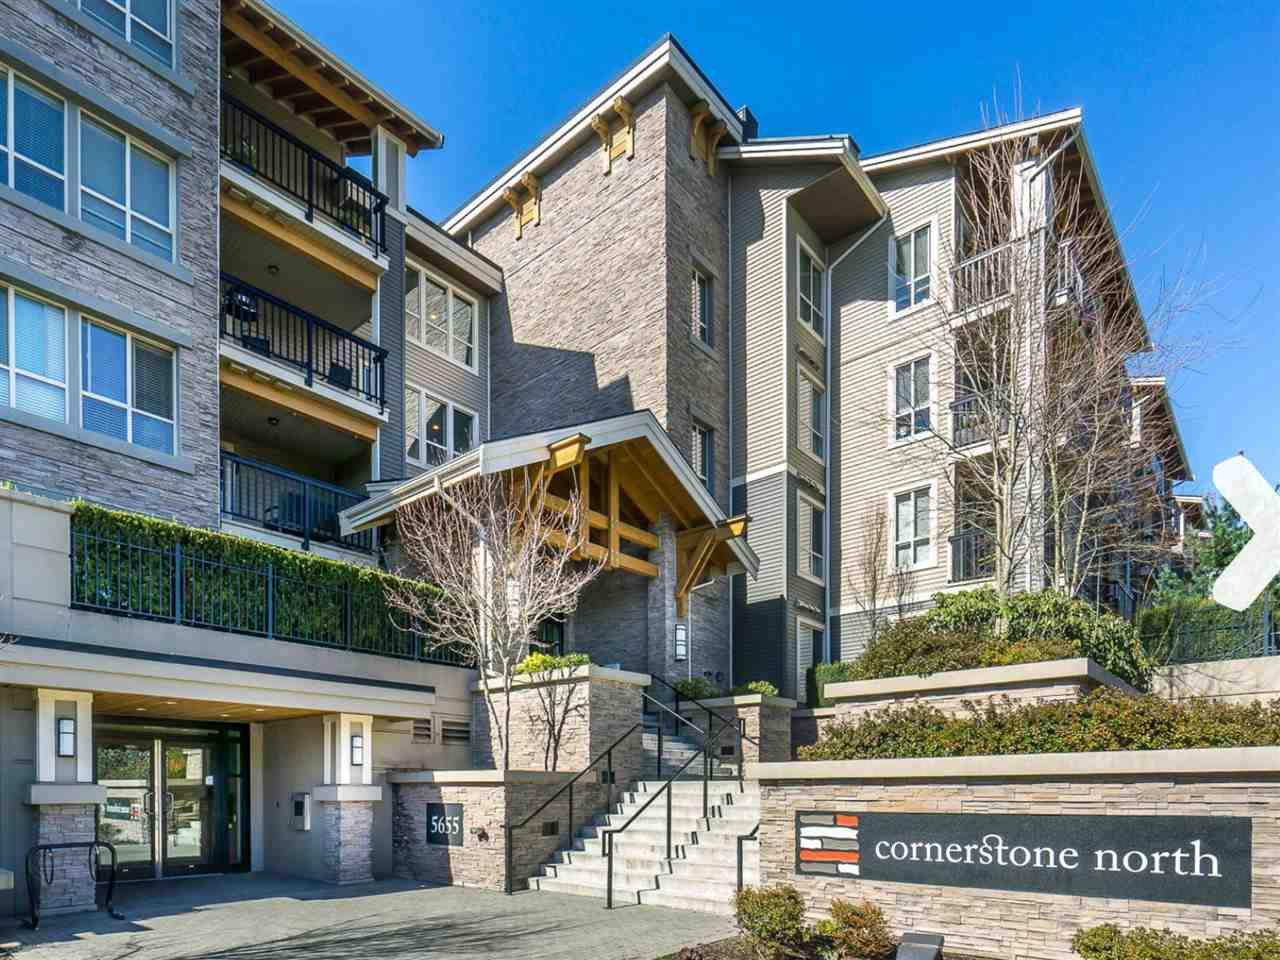 "Main Photo: 303 5655 210A Street in Langley: Salmon River Condo for sale in ""CORNERSTONE NORTH"" : MLS®# R2267414"